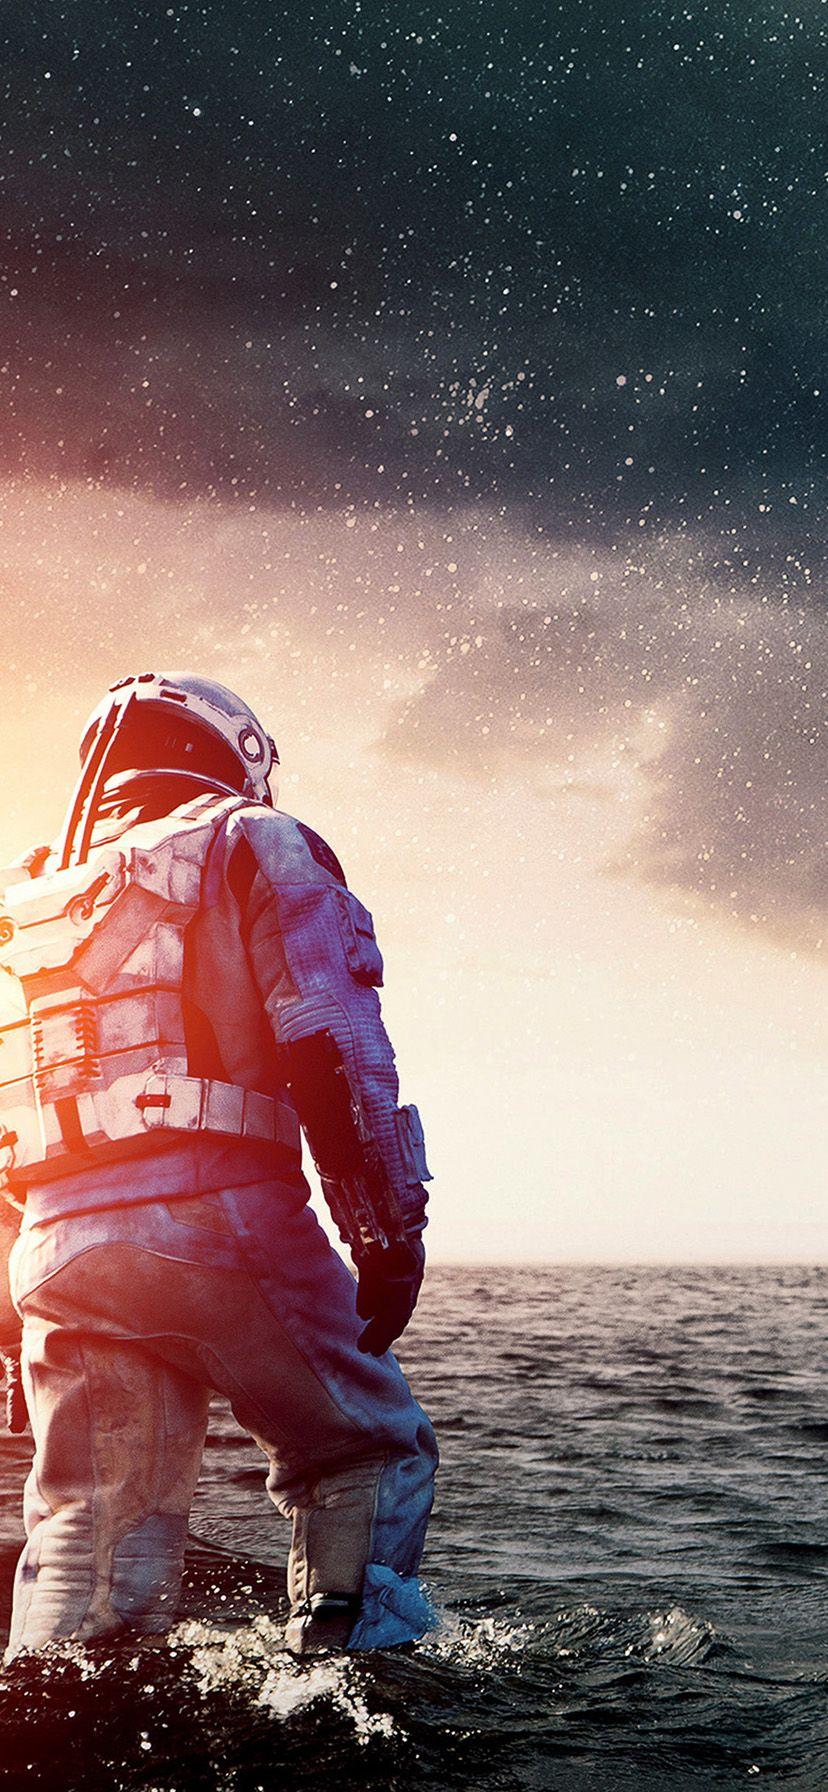 iPhone XR Wallpaper HD Interstellar Wide Space Film Movie